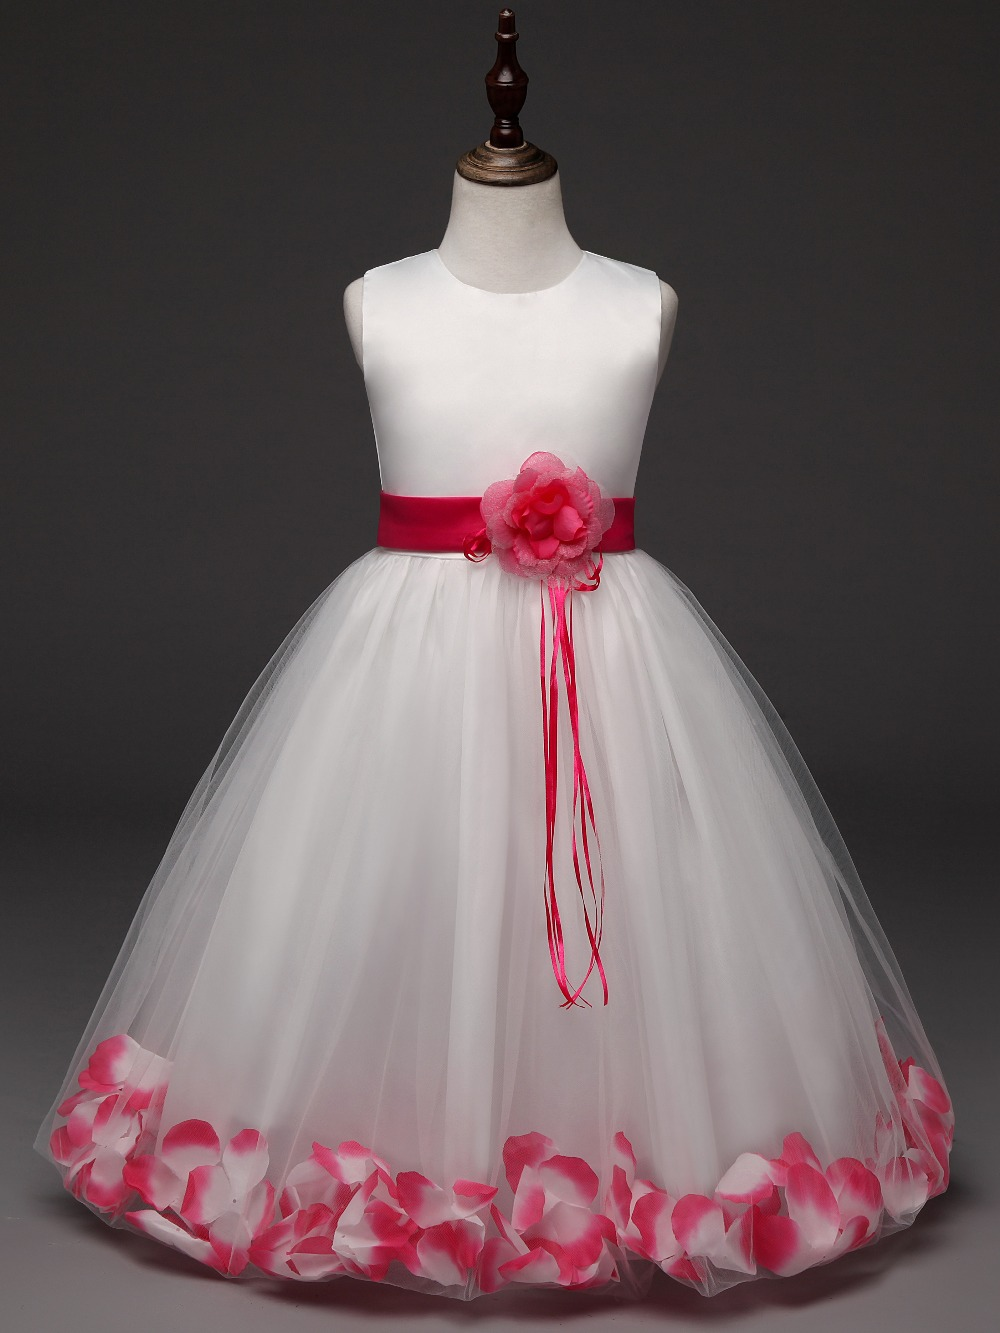 Blumenmädchen kinder Kleidung Petal Saum Party Mädchen Tüll Kleid ...